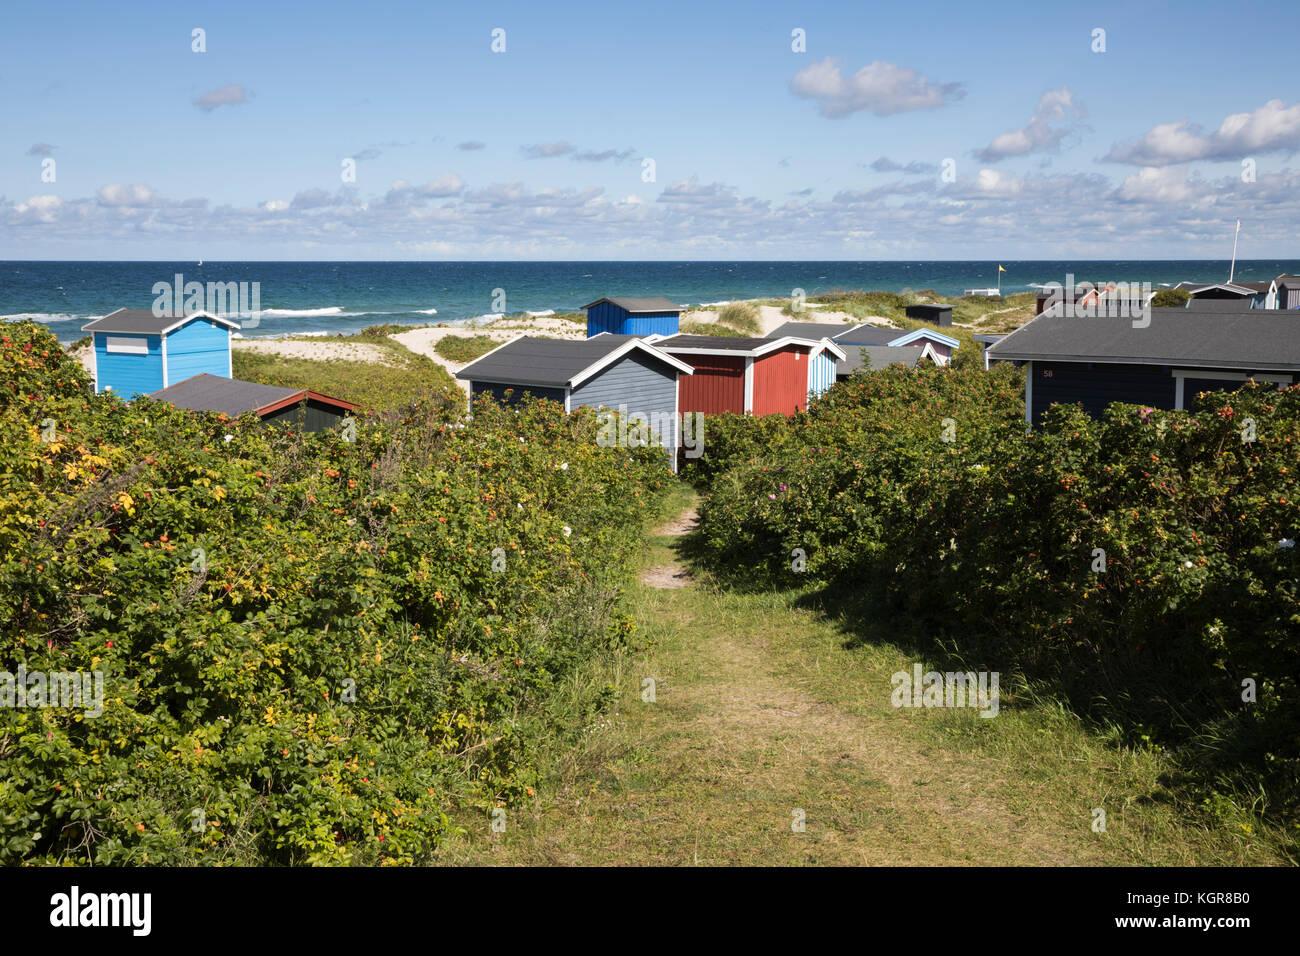 Beach huts among sand dunes with blue sea behind, Tisvilde, Kattegat Coast, Zealand, Denmark, Europe - Stock Image